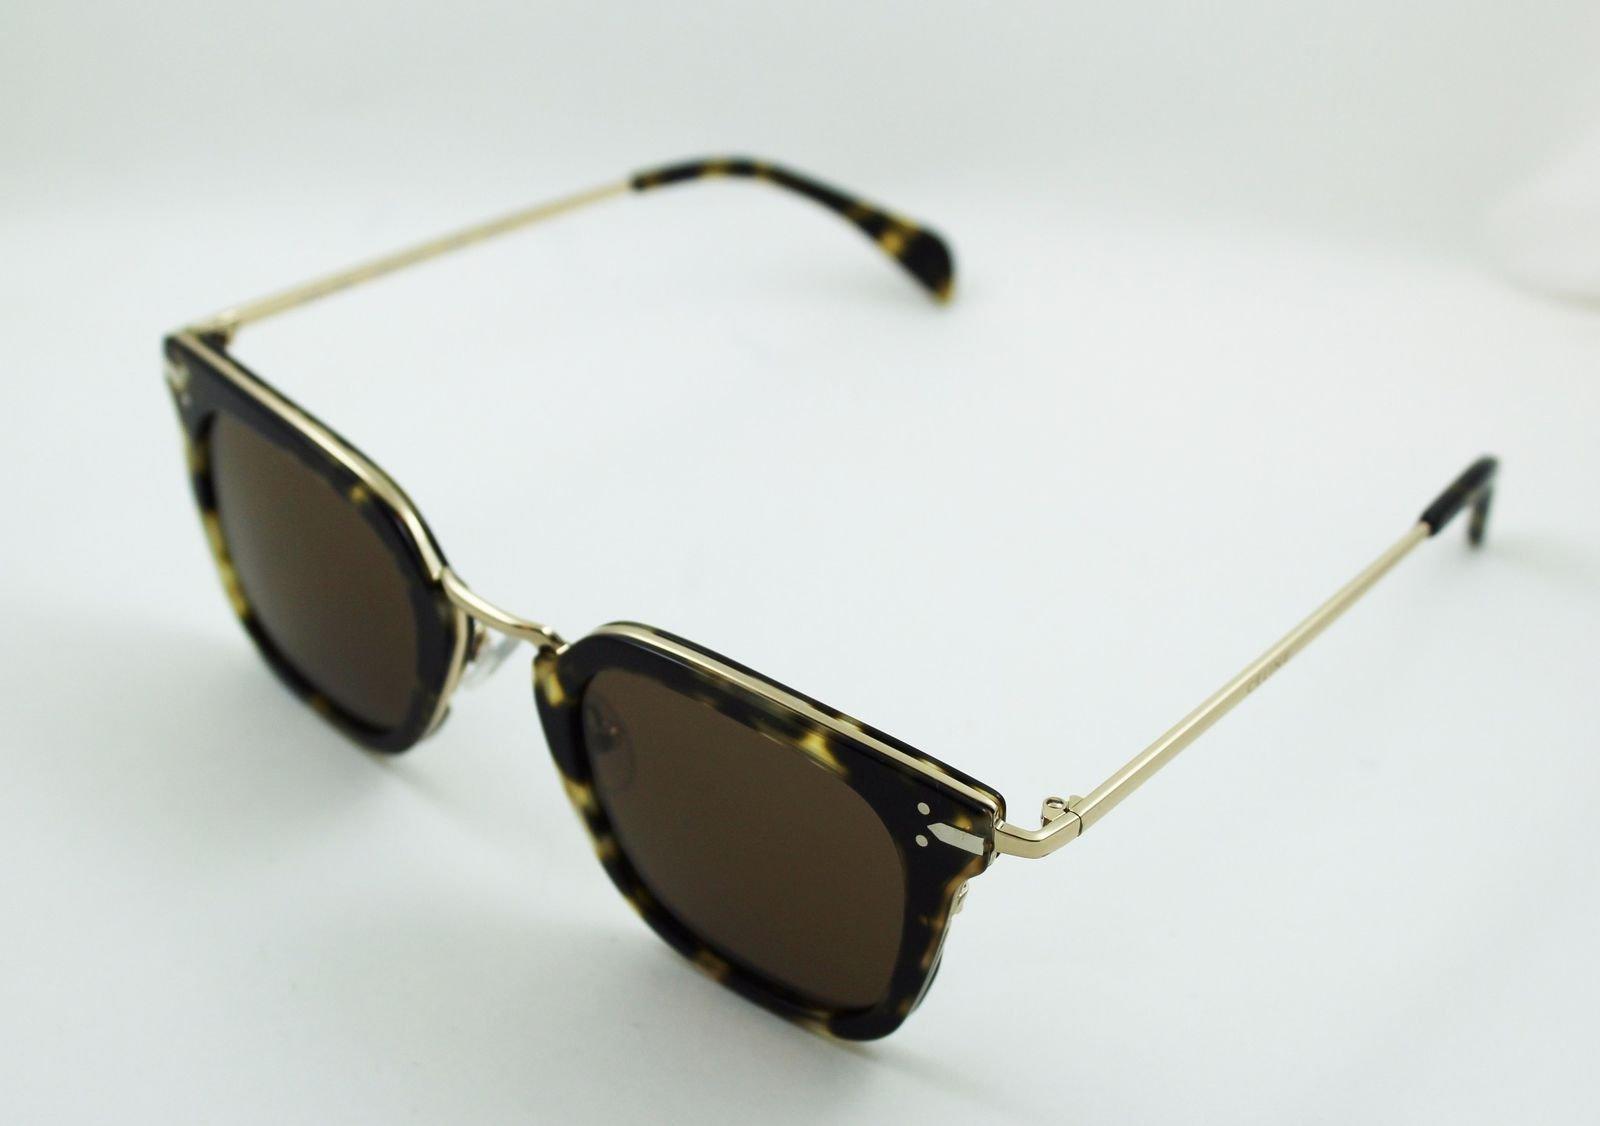 de5e79db38b2 Celine CL41402 s Square Sunglasses Gold and Havana Green Frame Solid Brown  Lens